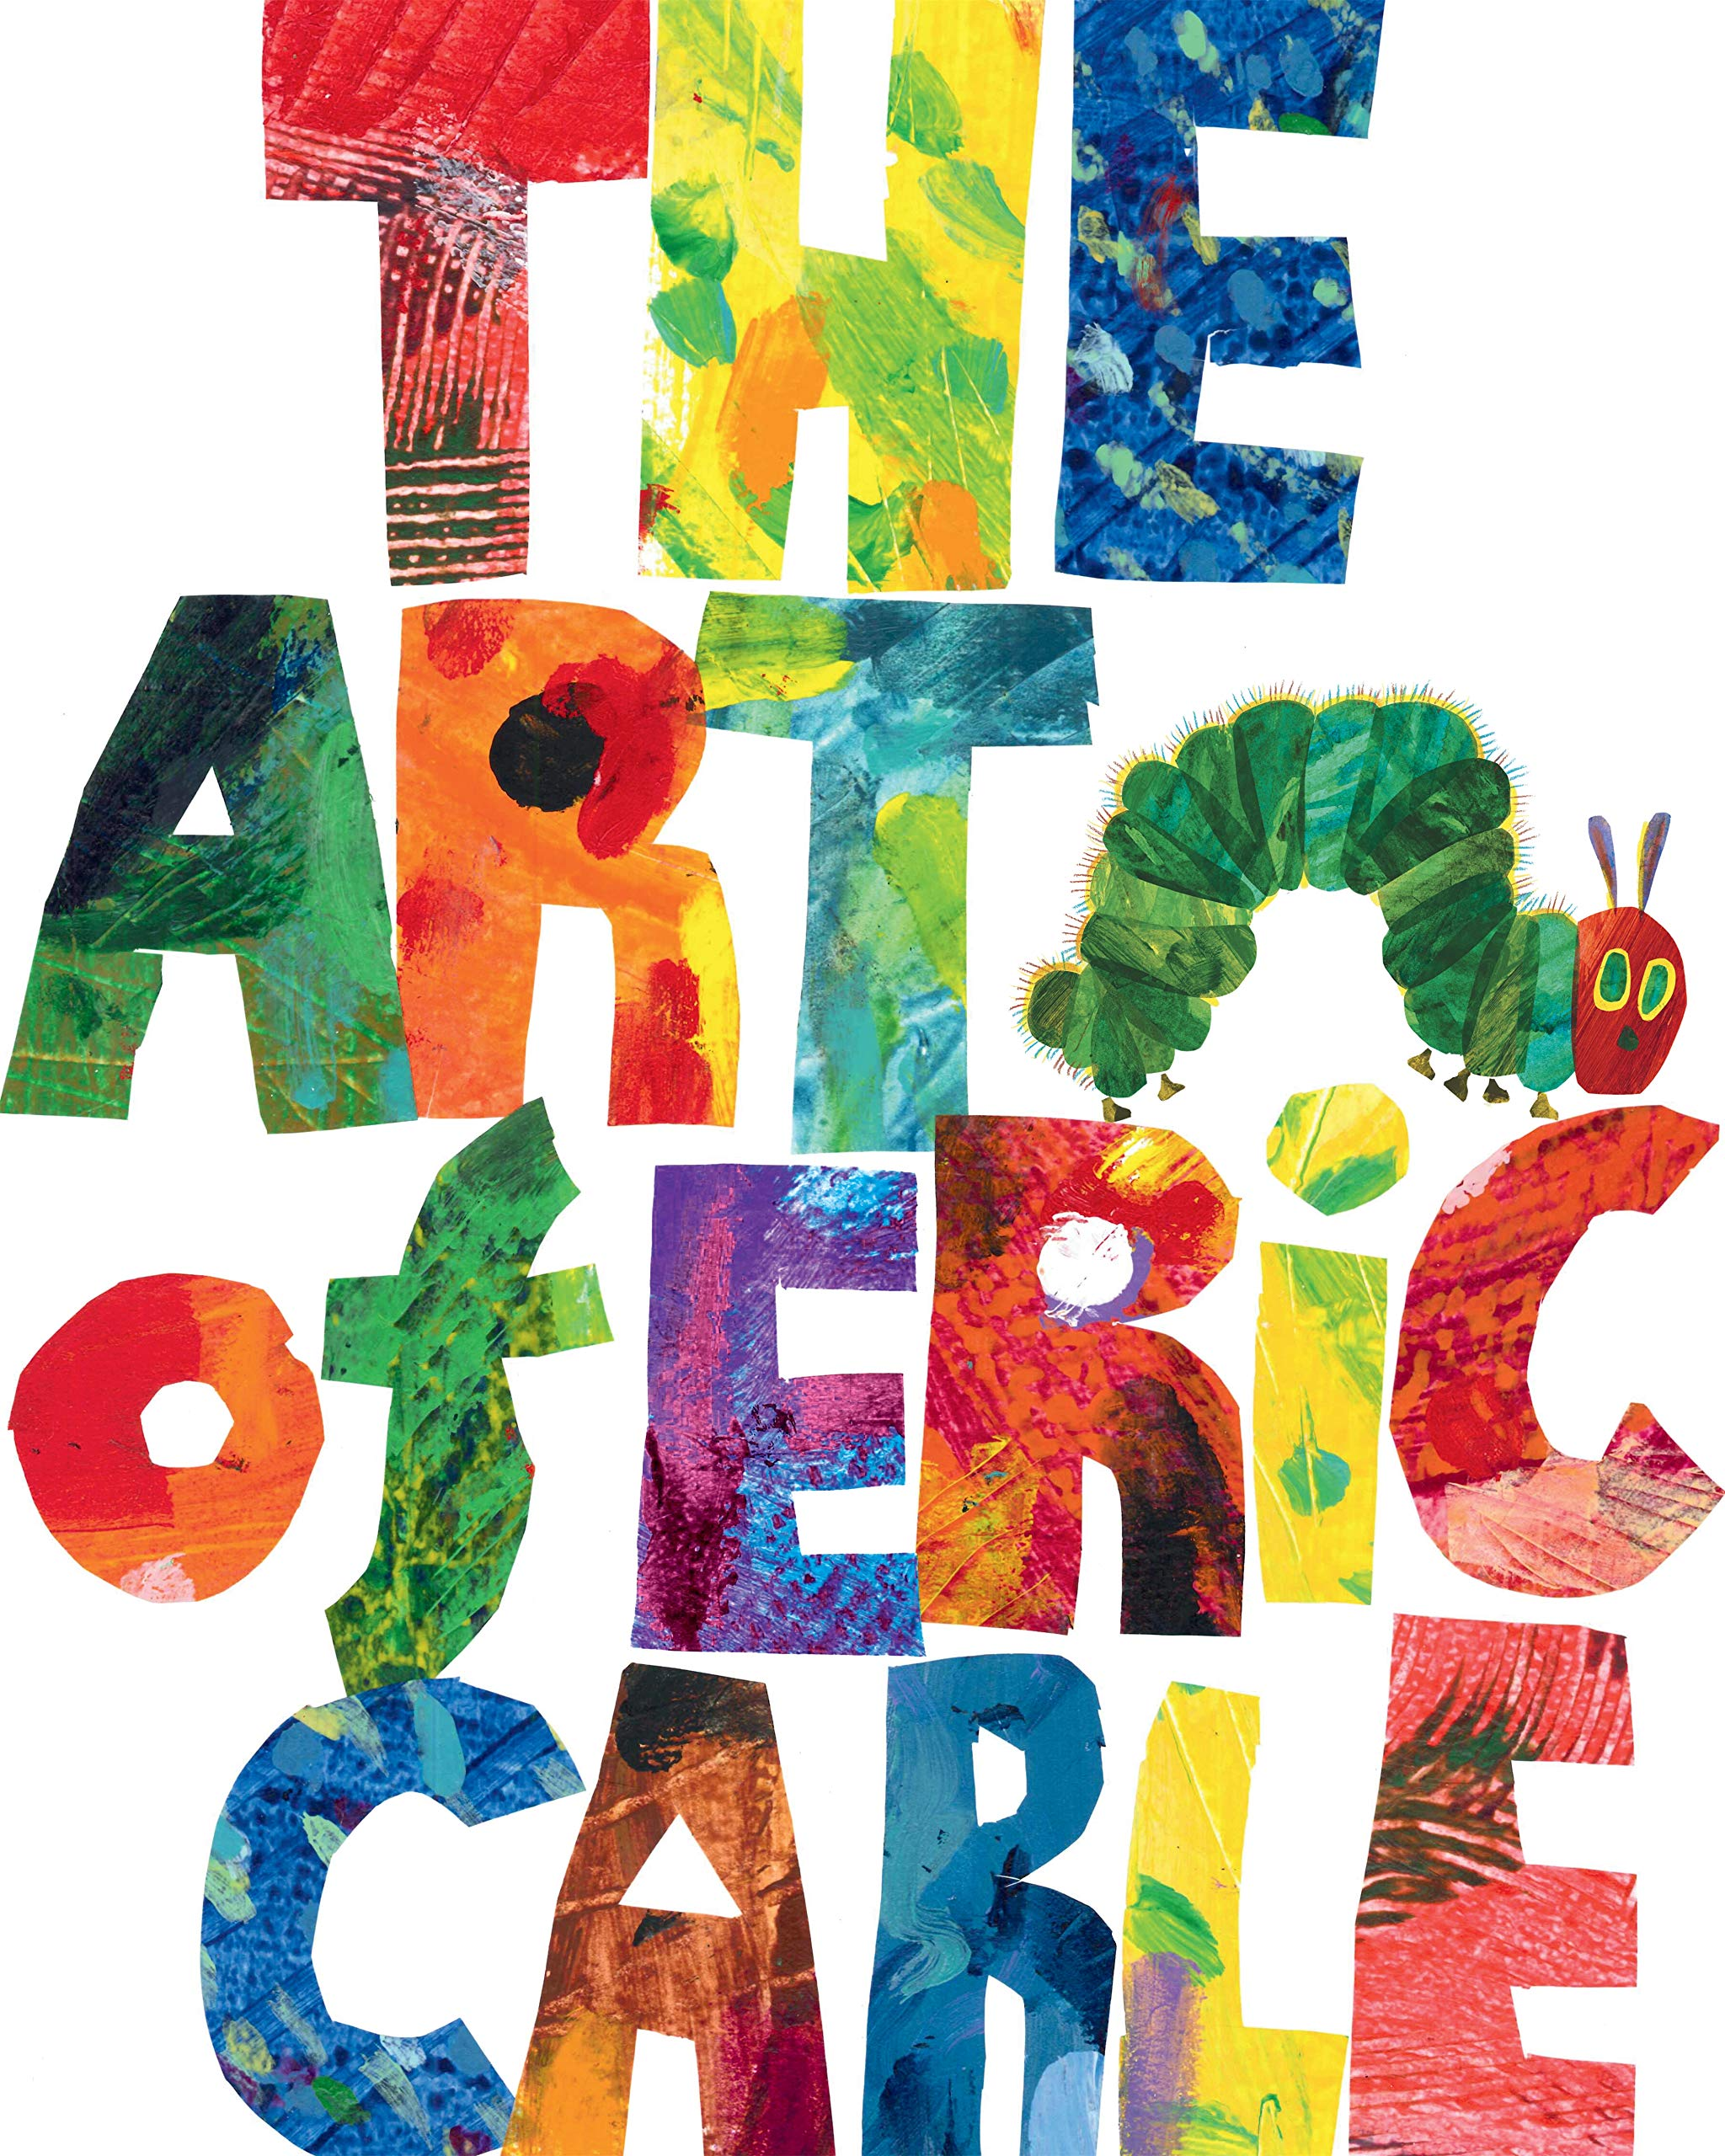 The Art of Eric Carle (The World of Eric Carle): Carle, Eric, Carle, Eric: 9781984813404: Amazon.com: Books